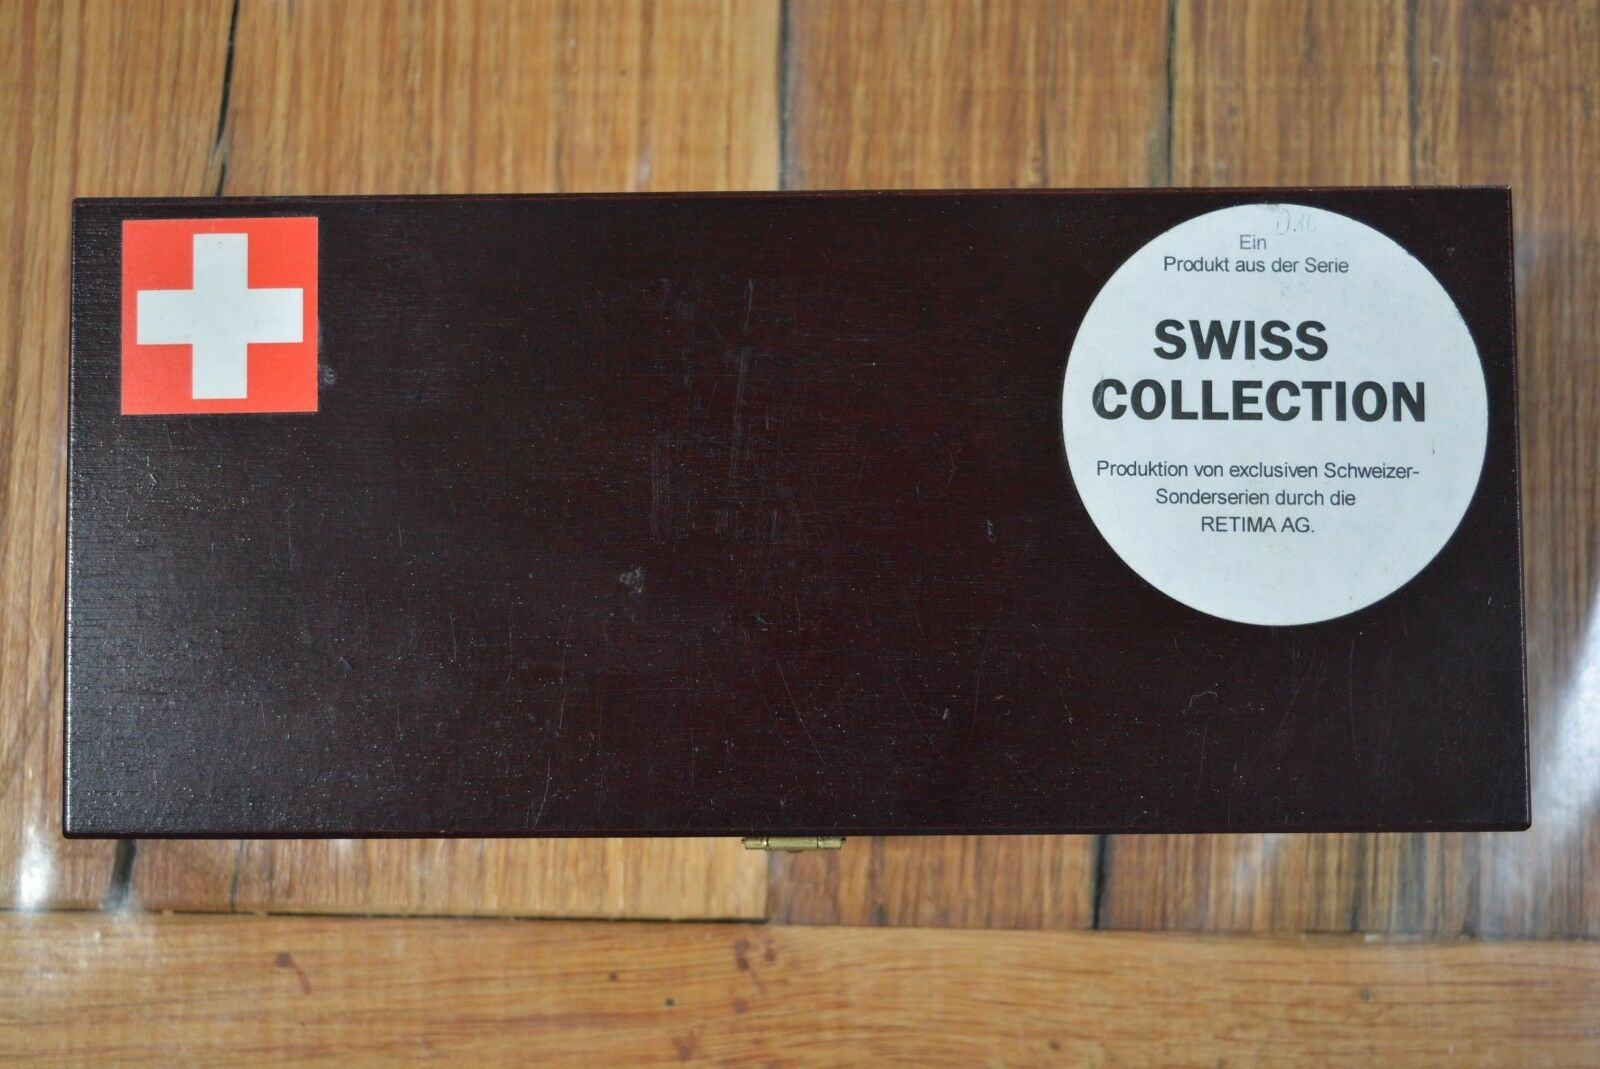 Arnold   Retima SBB Rbe 4 4 seetal - version limited edition selten spezial mode